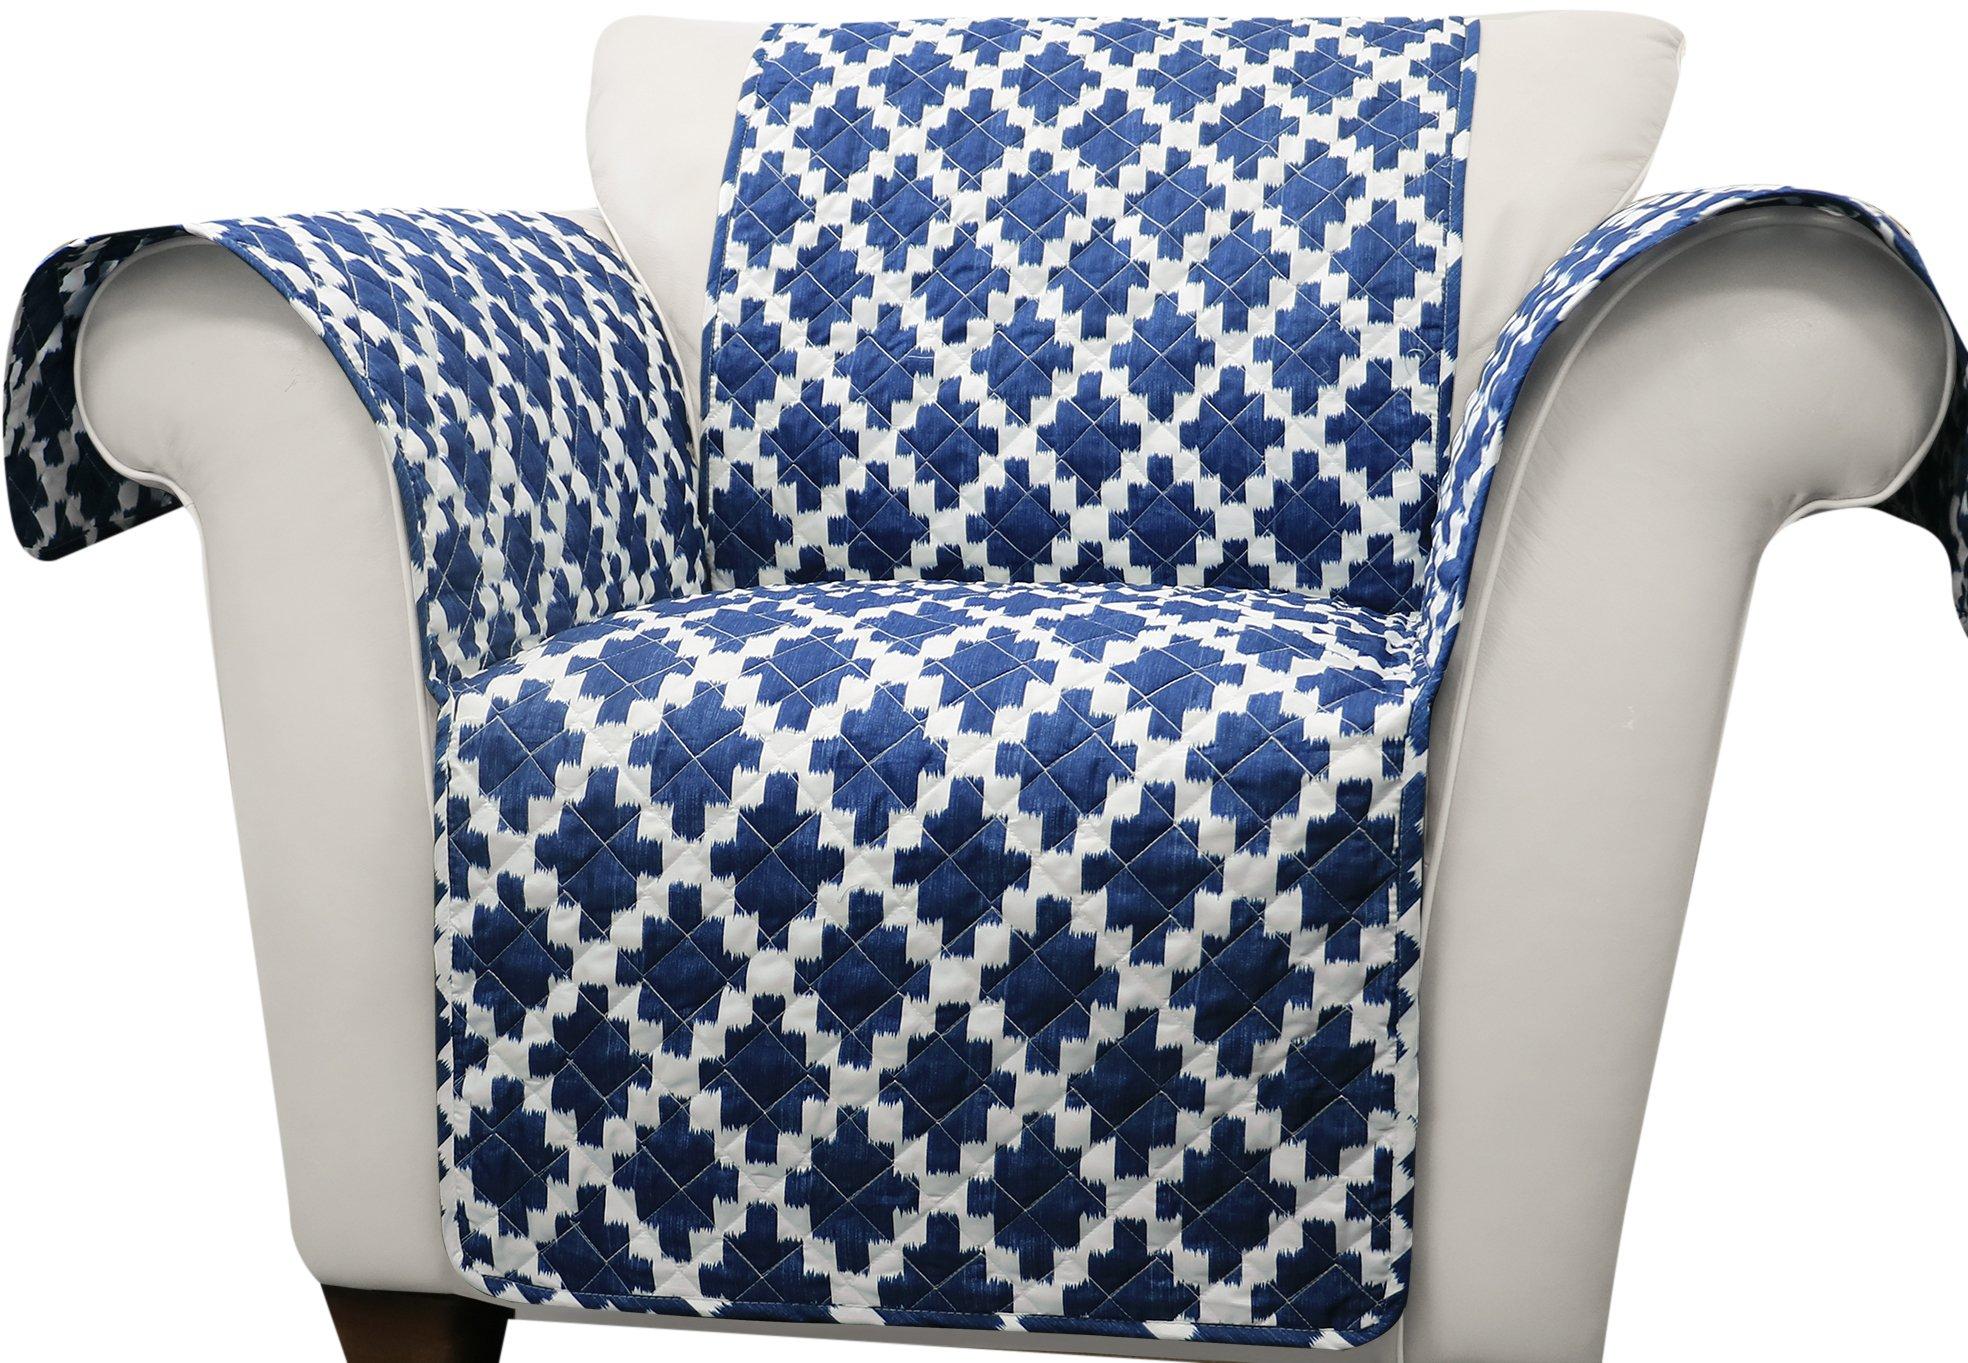 Lush Decor Ikat Arm Chair Furniture Protector, Navy